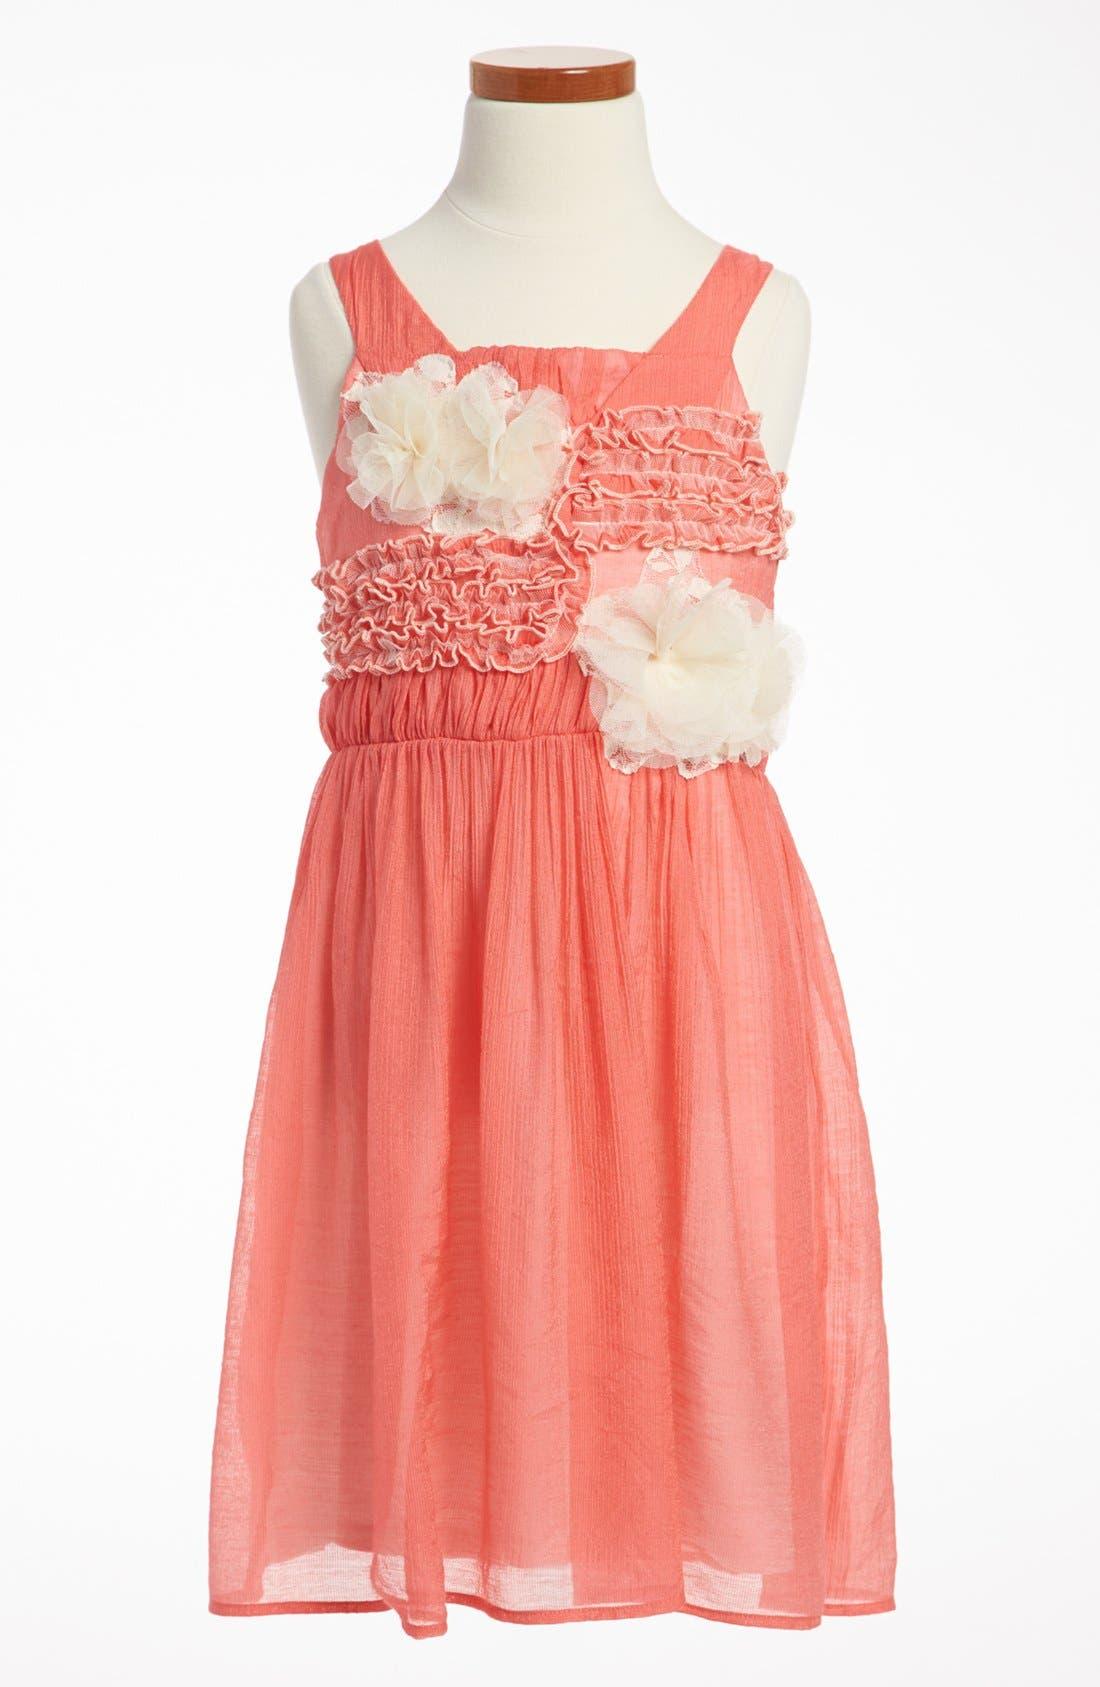 Main Image - Isobella & Chloe 'Vicky' Dress (Little Girls & Big Girls)